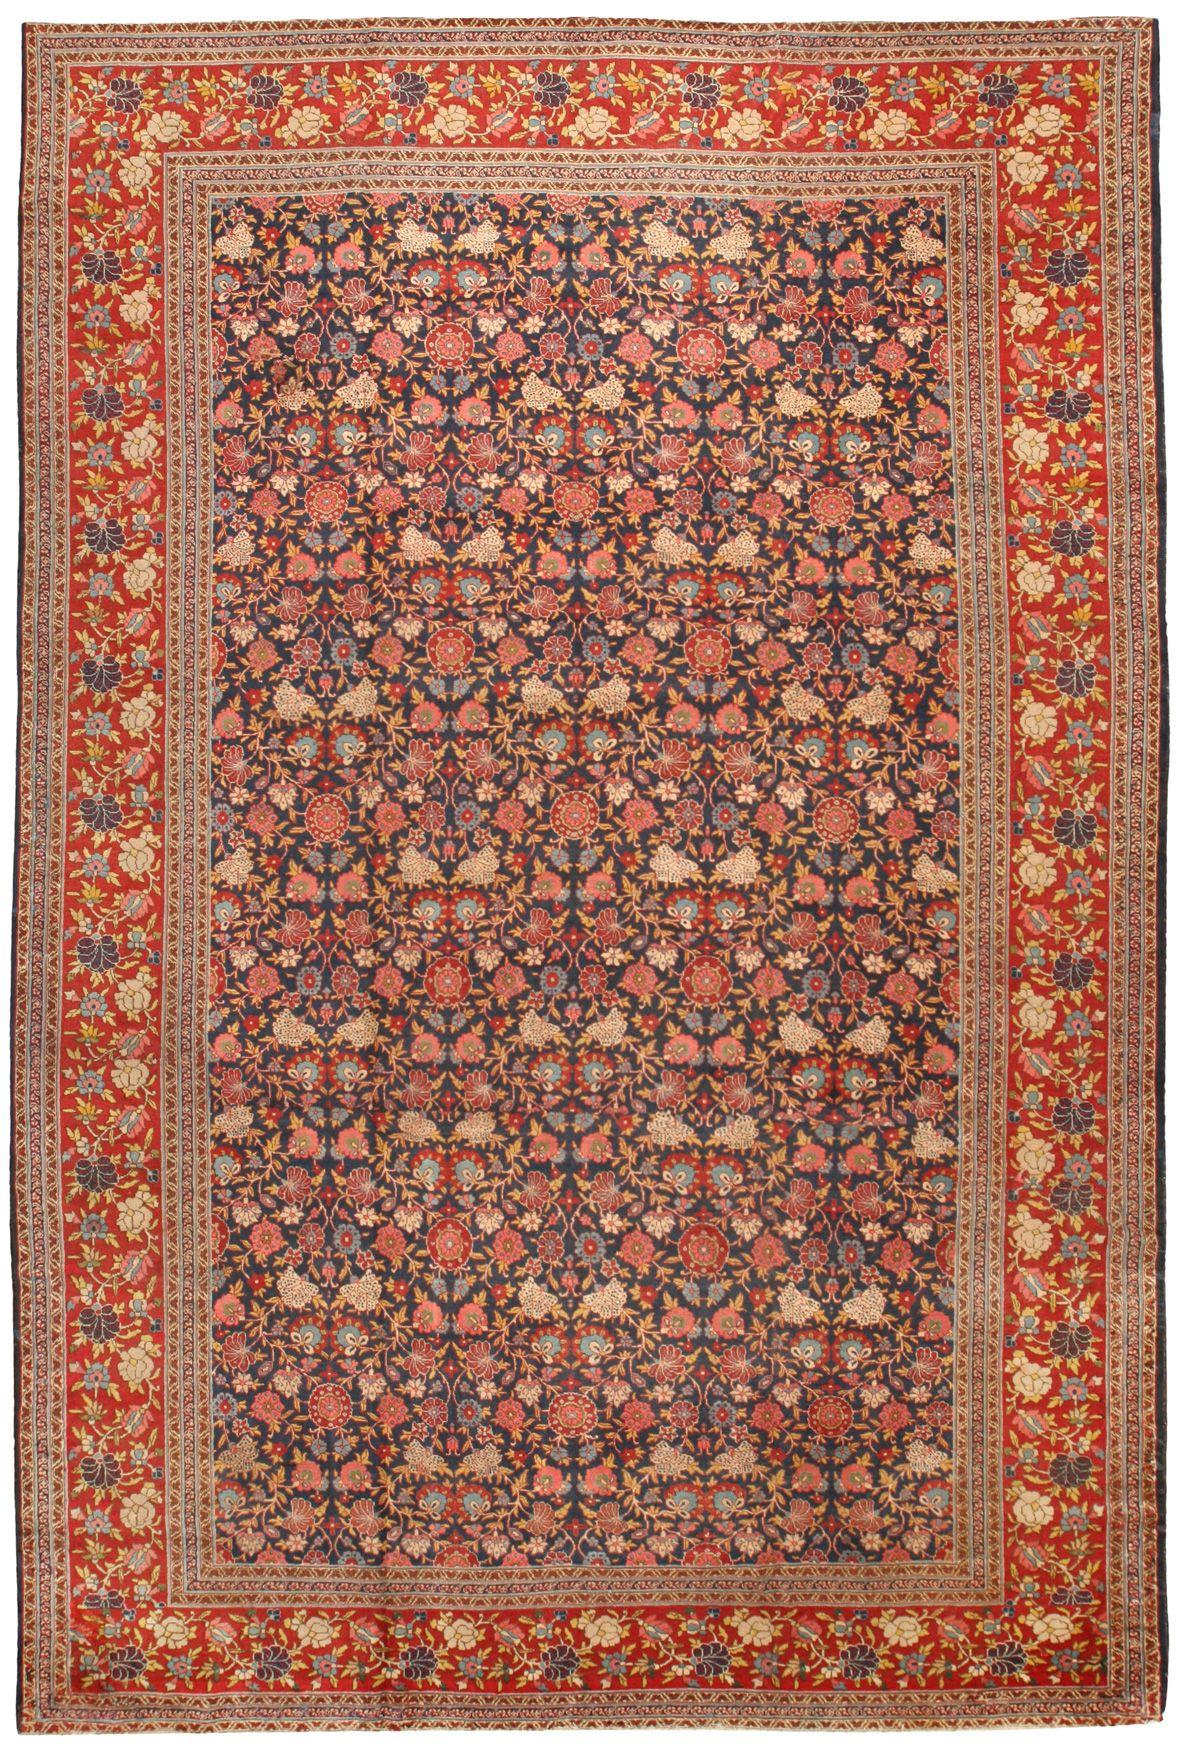 Antique Tabriz Carpet 11.9 X 17.11 - Antique Rugs and Carpets